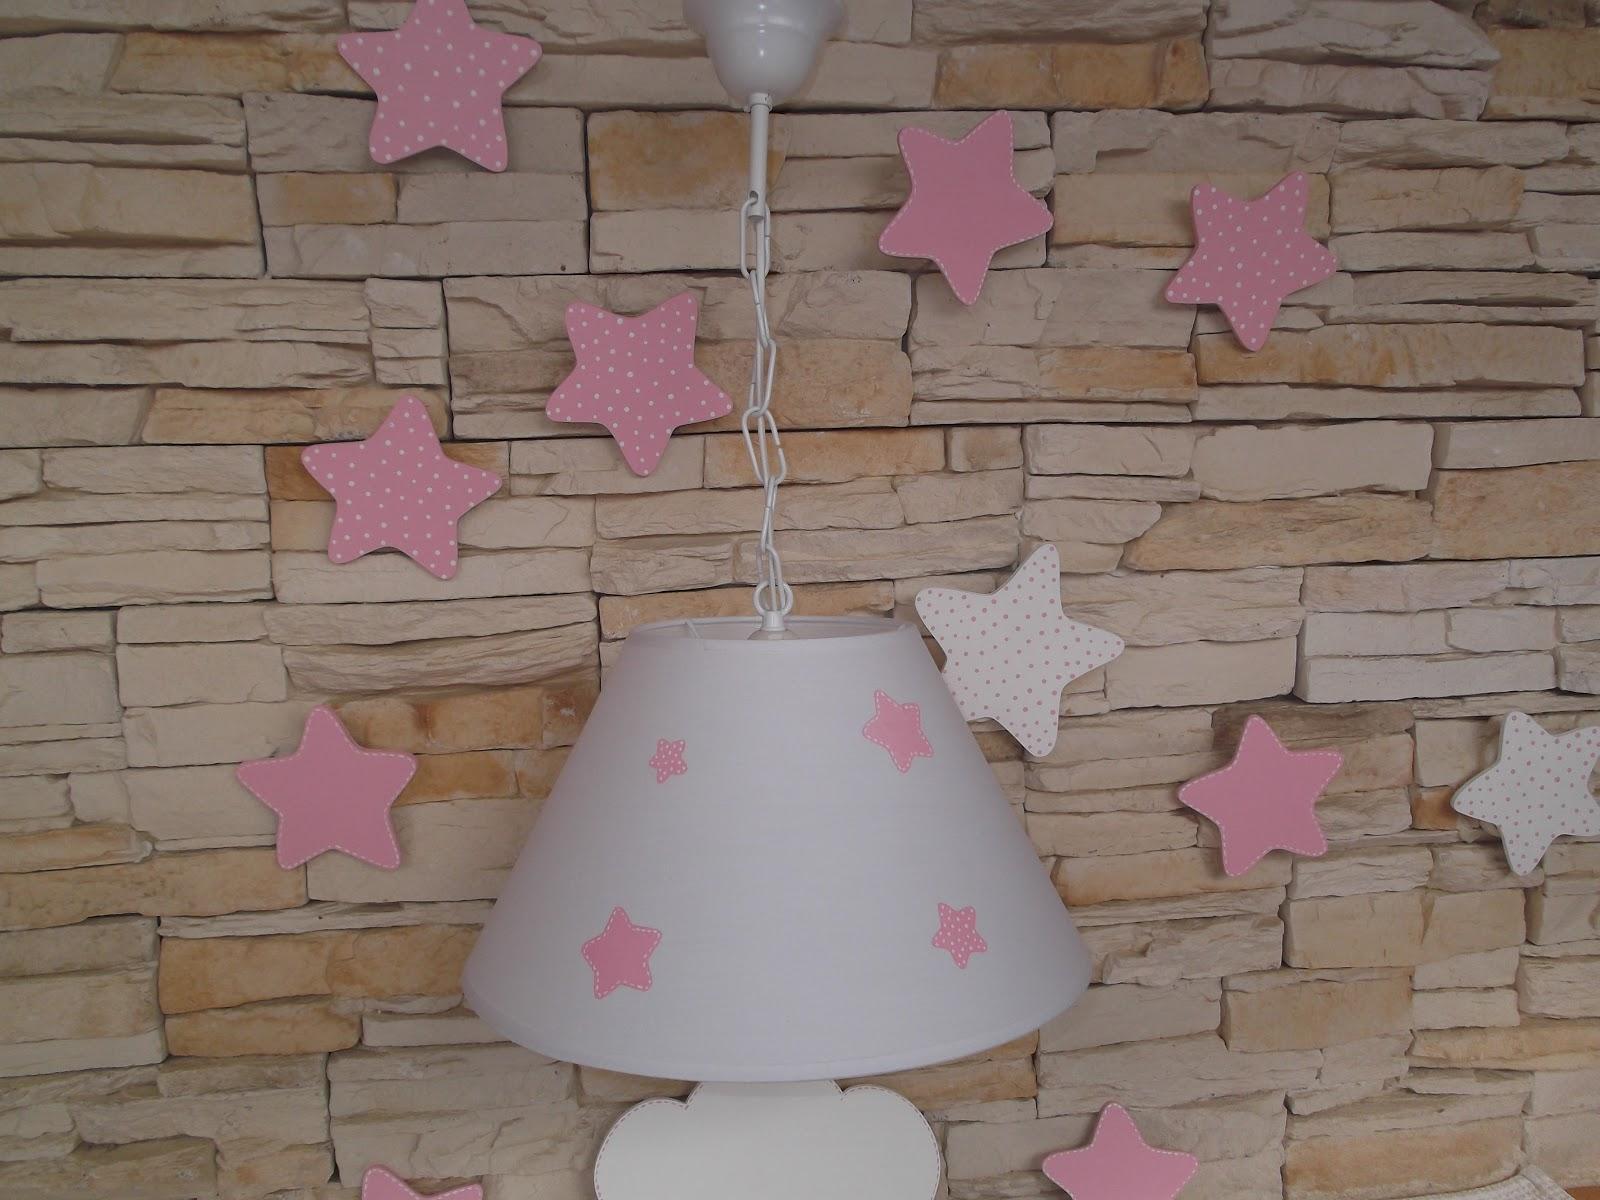 Decoraci n infantil pekerines lampara con estrellas rosas - Estrellas decoracion infantil ...